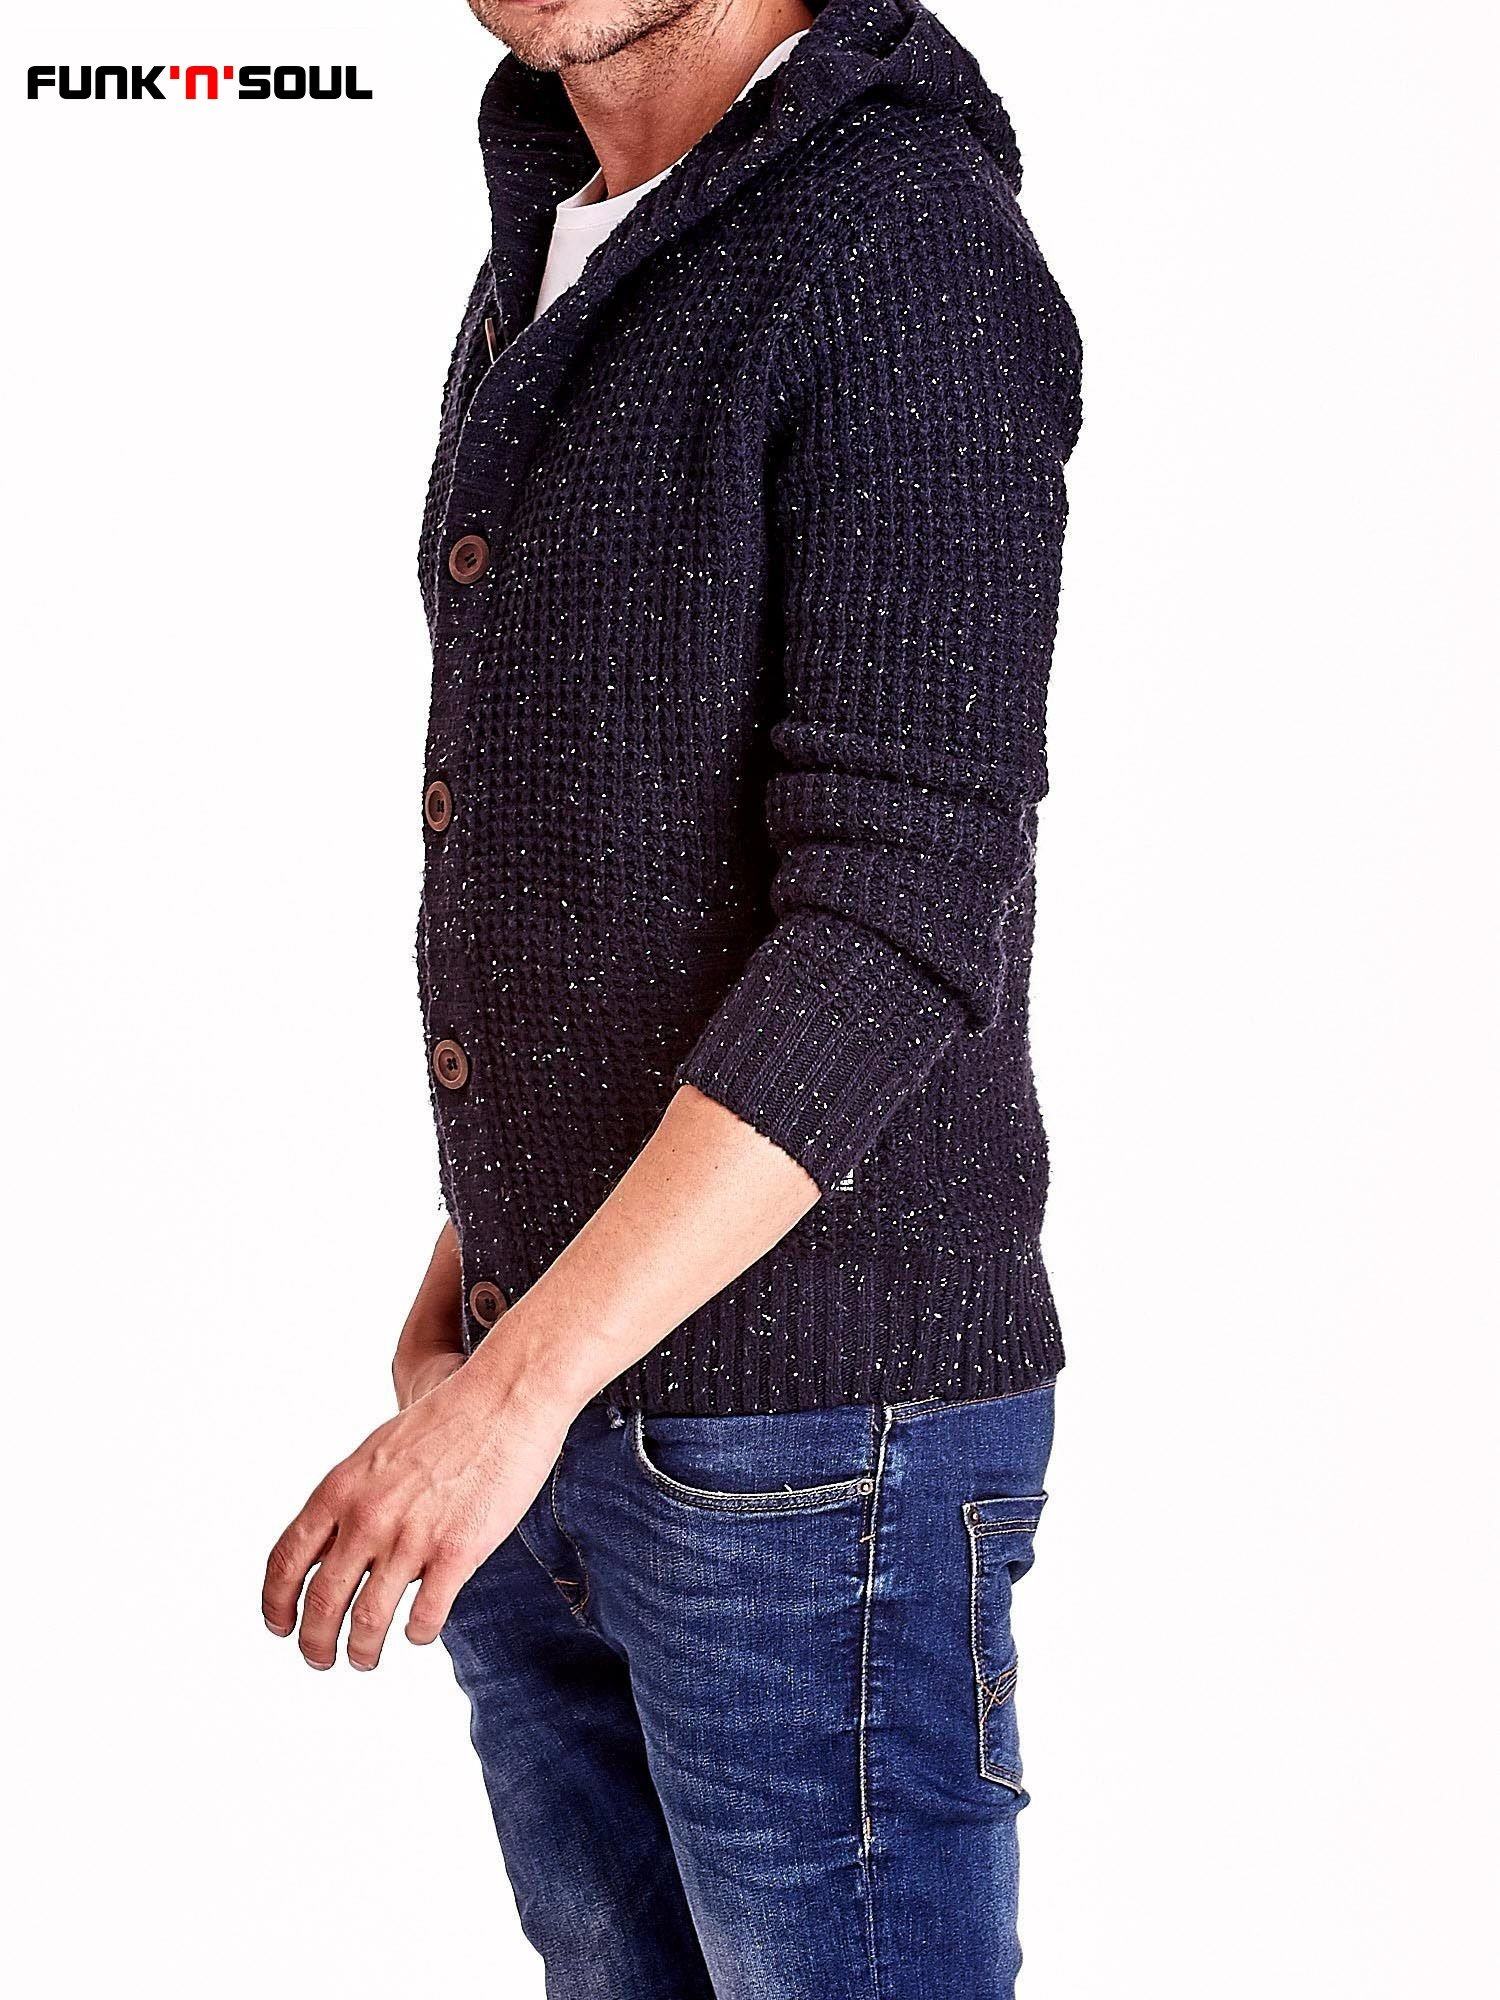 Granatowy sweter męski z kapturem FUNK N SOUL                                  zdj.                                  4